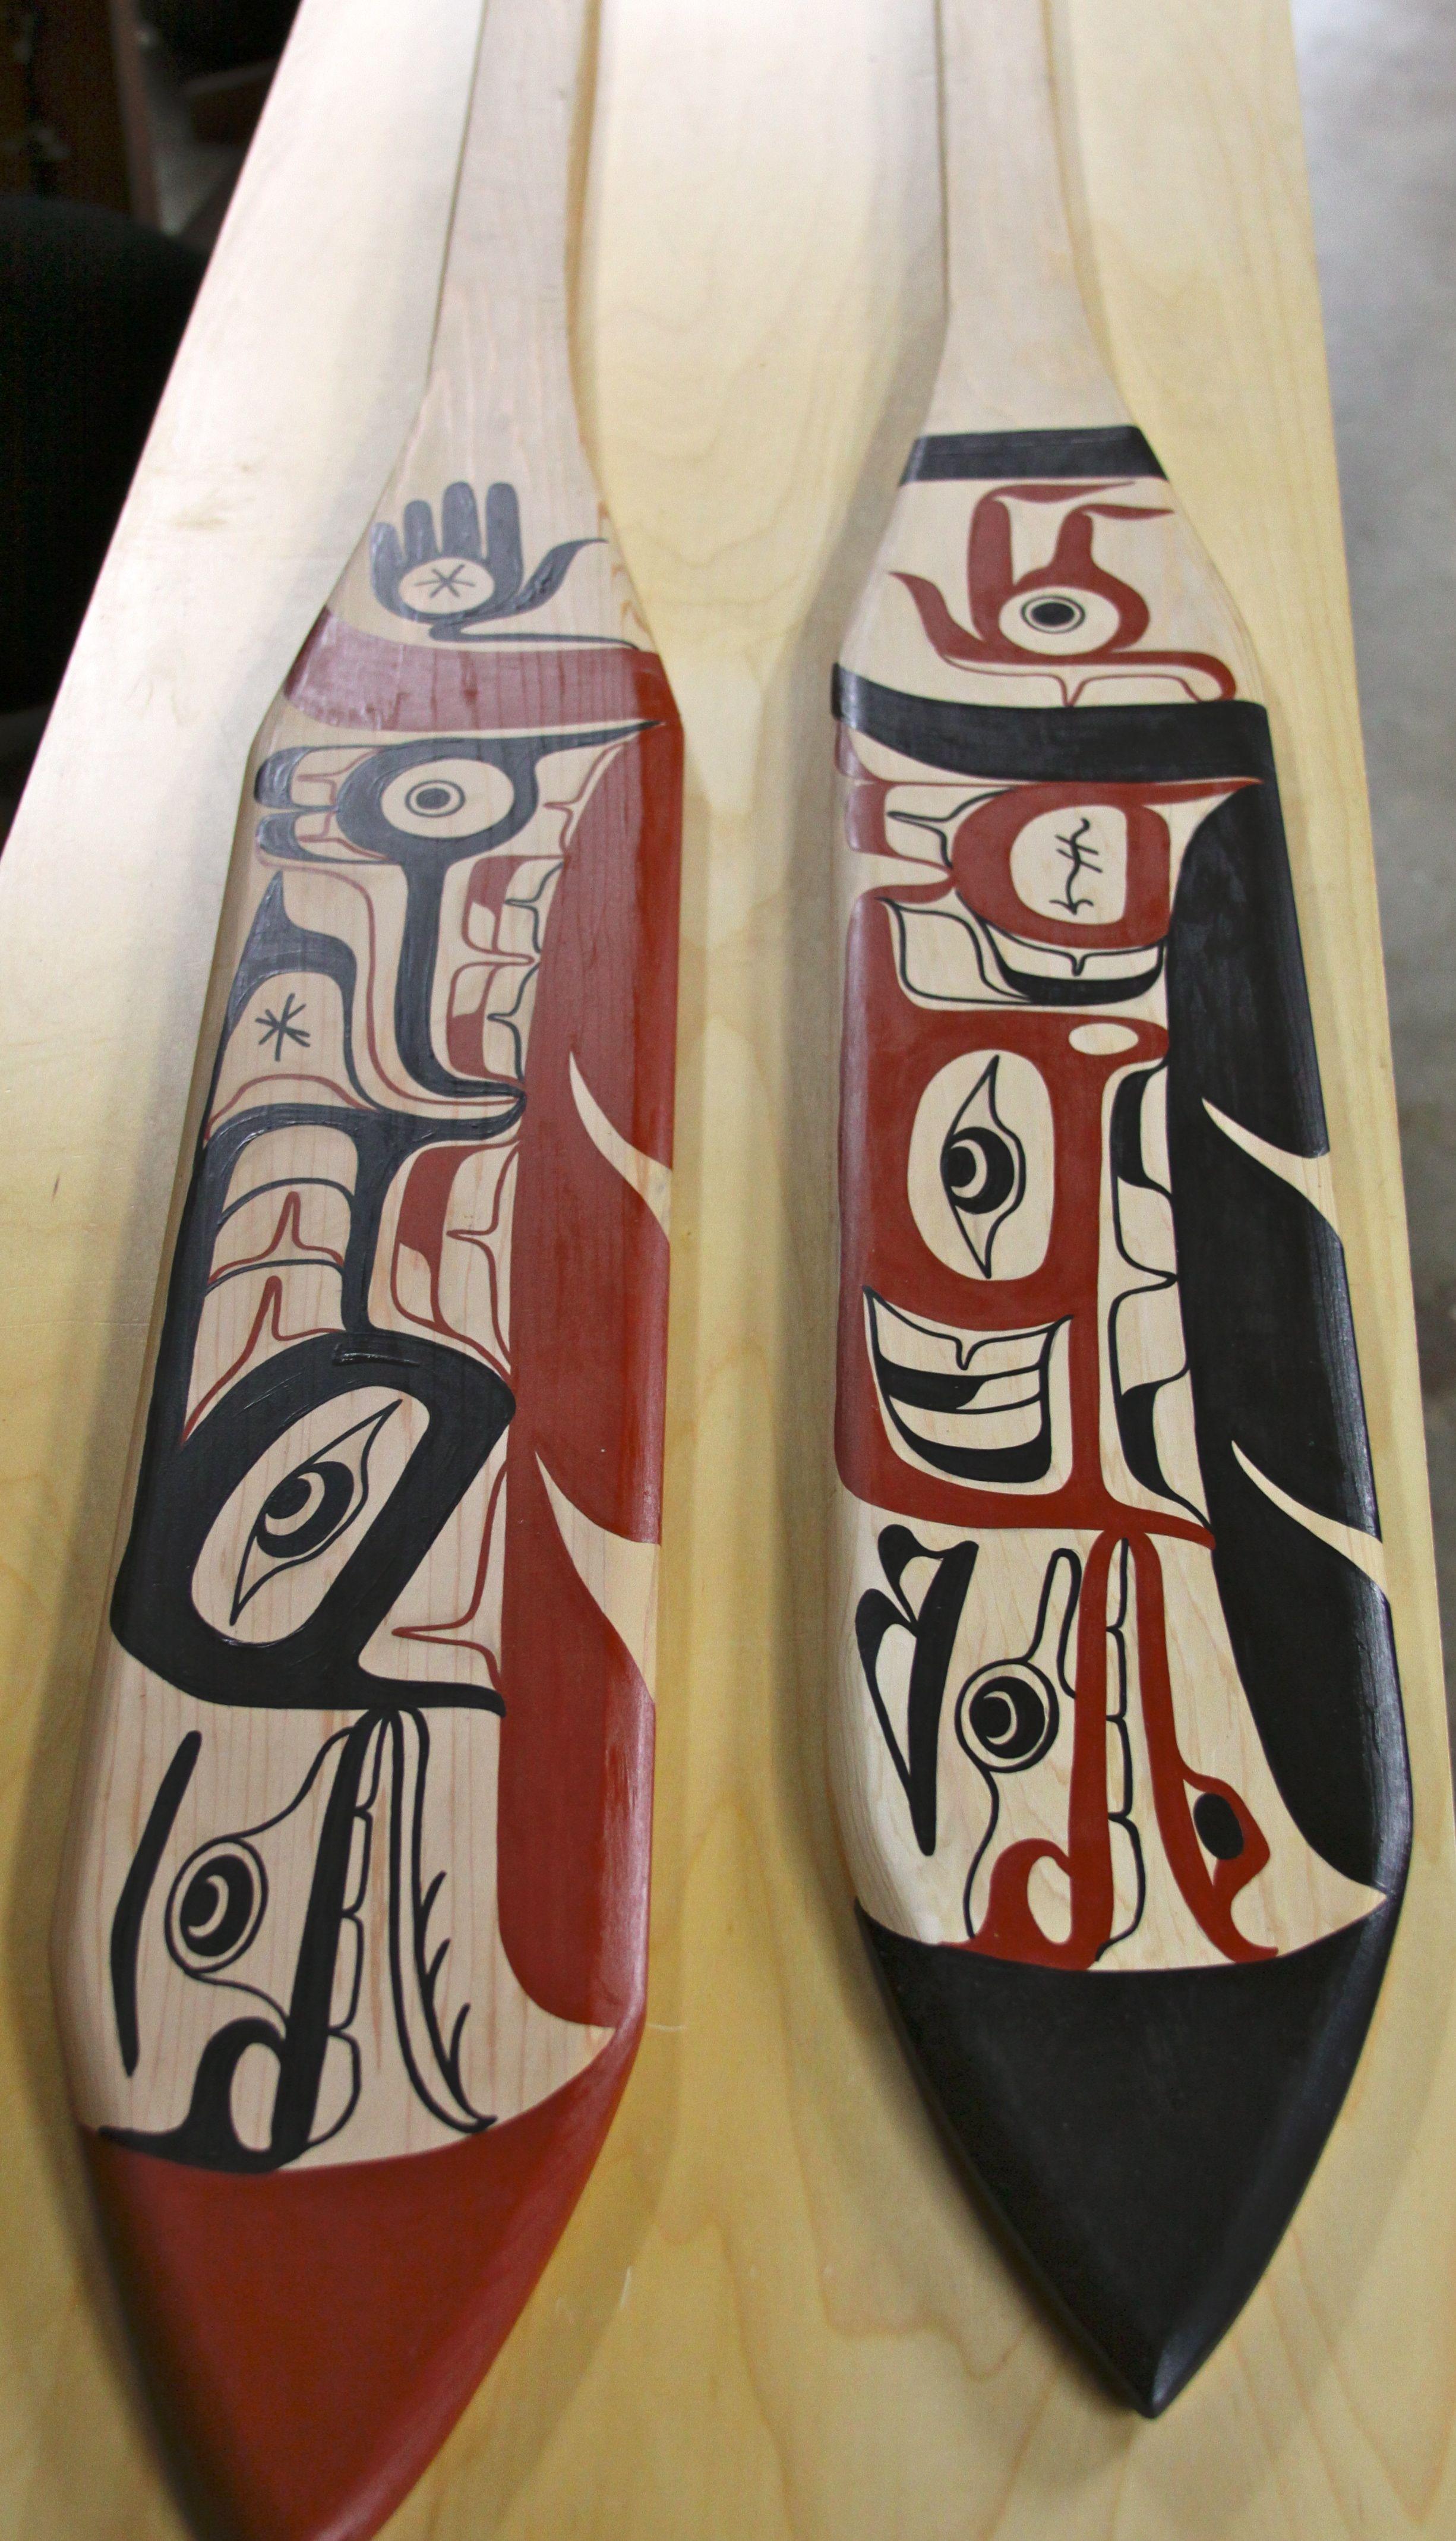 tlingit culture | Tlingit Culture | Pinterest | Tlingit